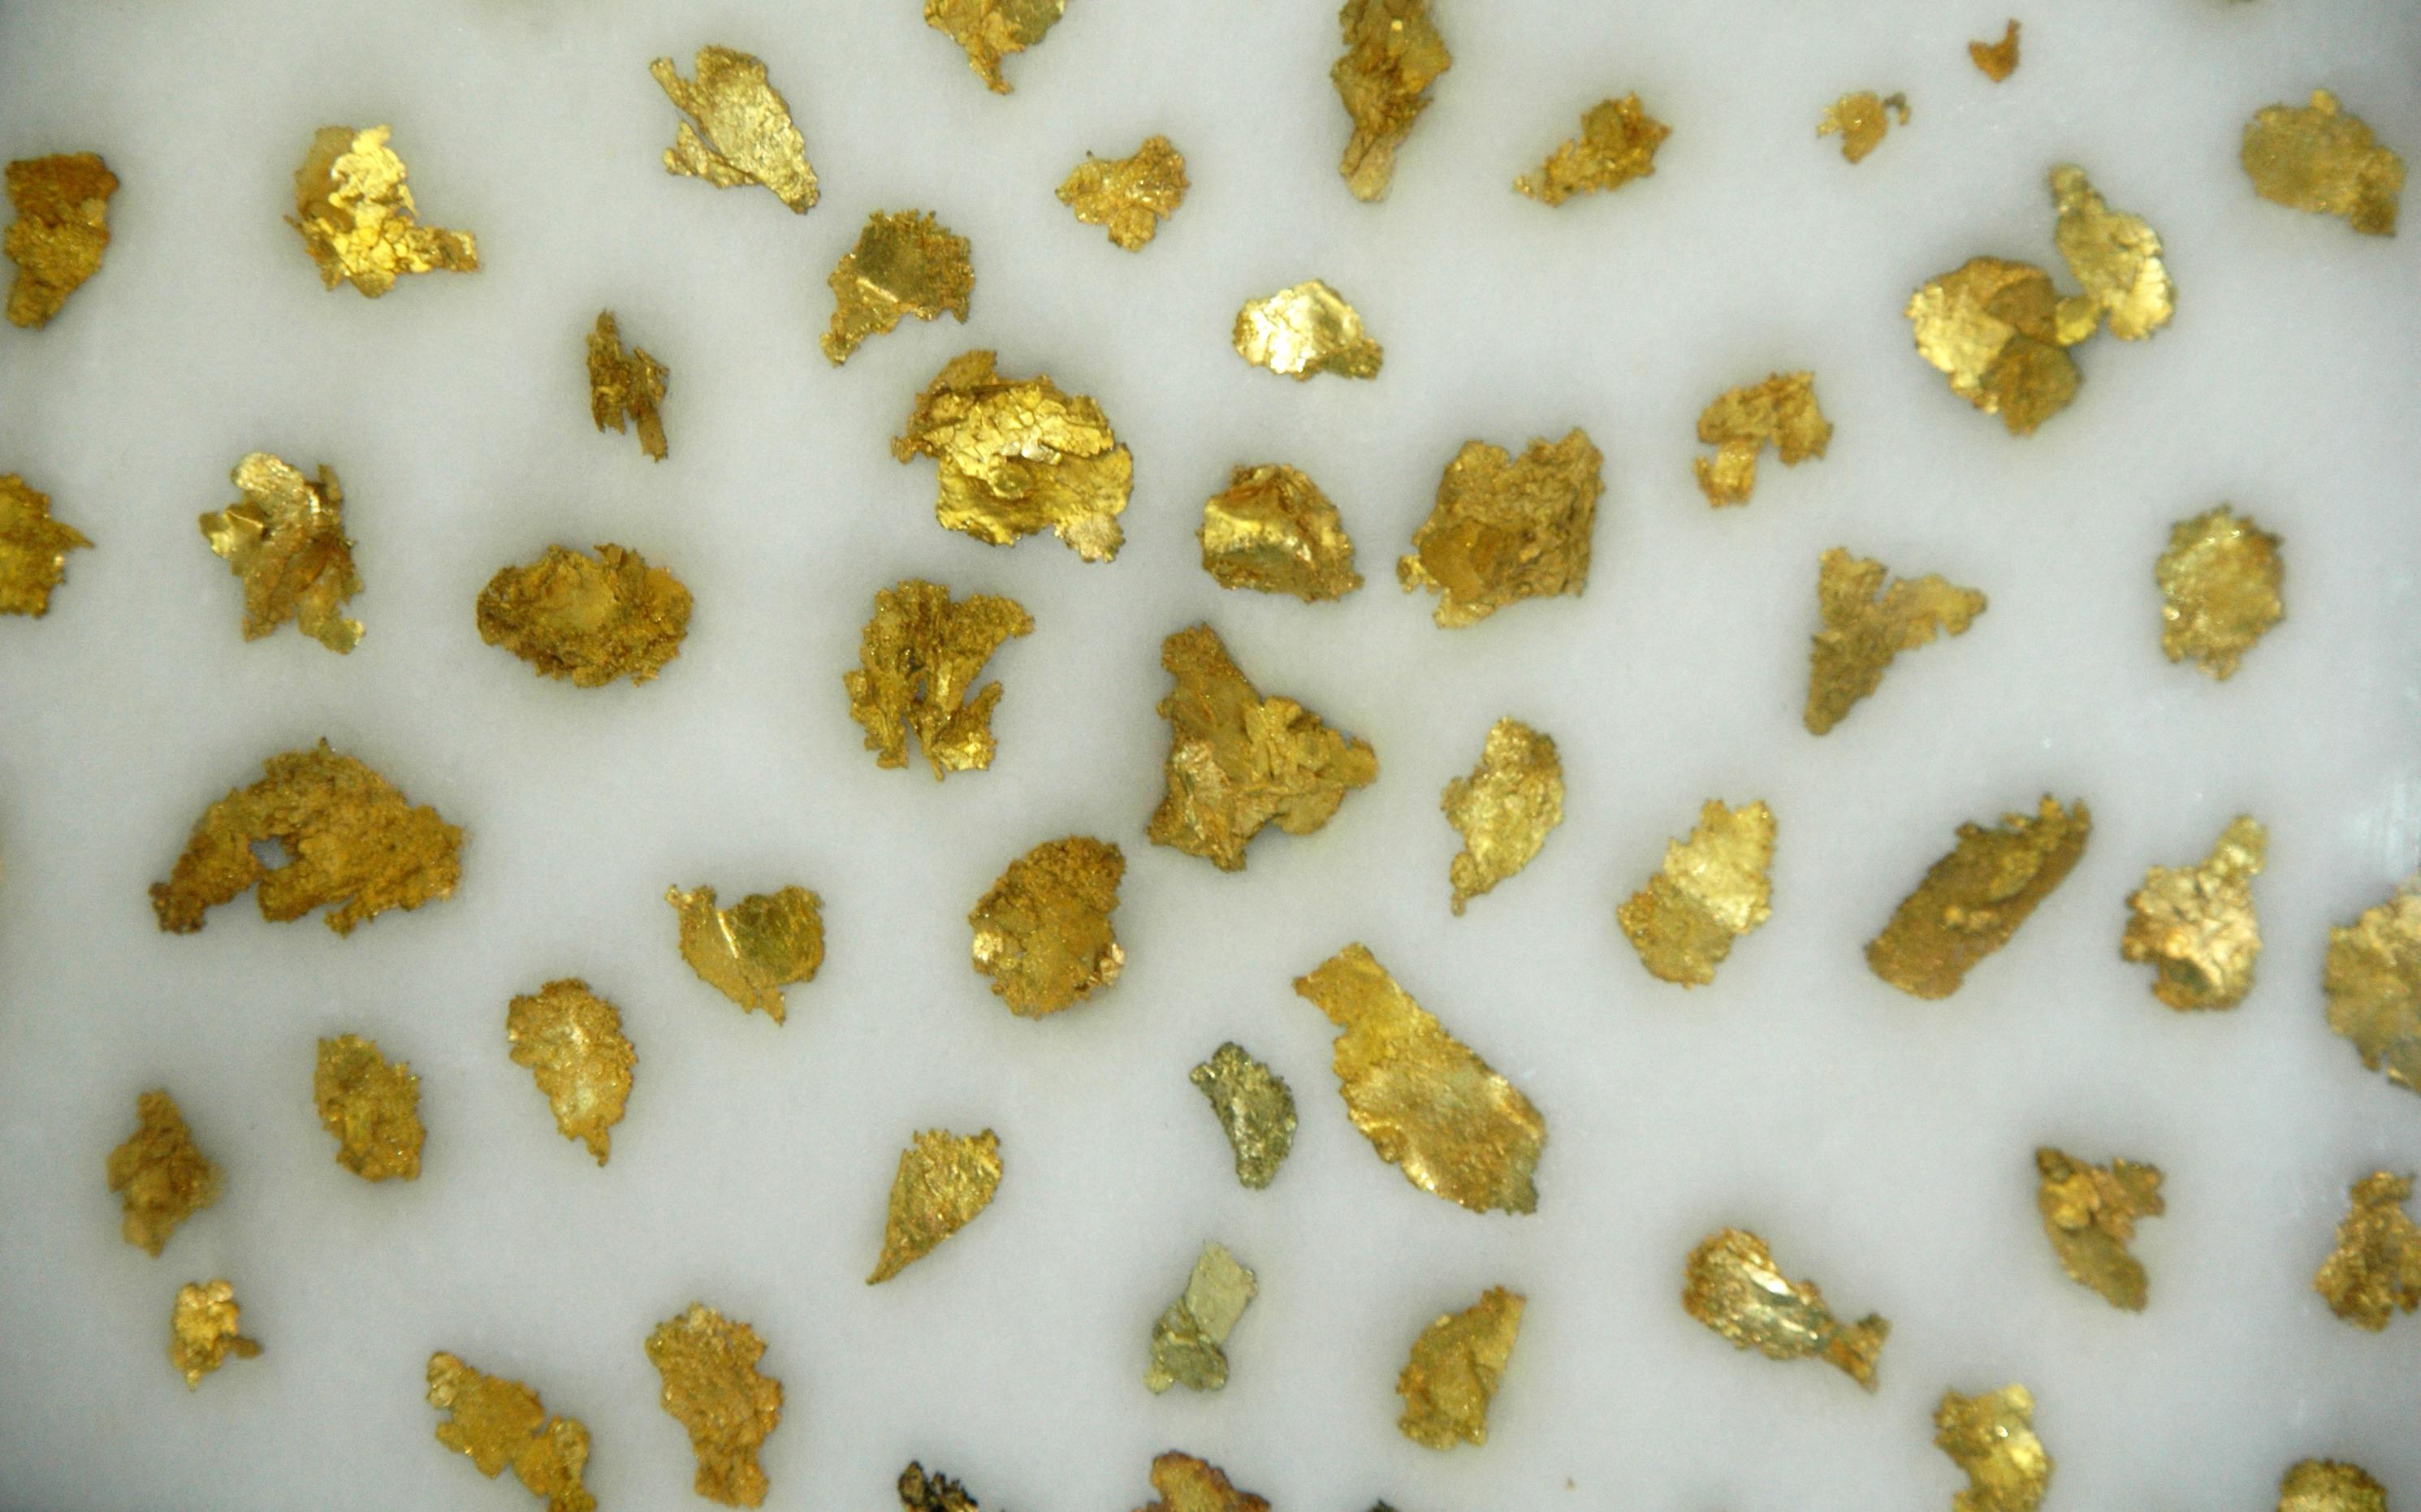 Gold Leaf Properties Clayton Nc